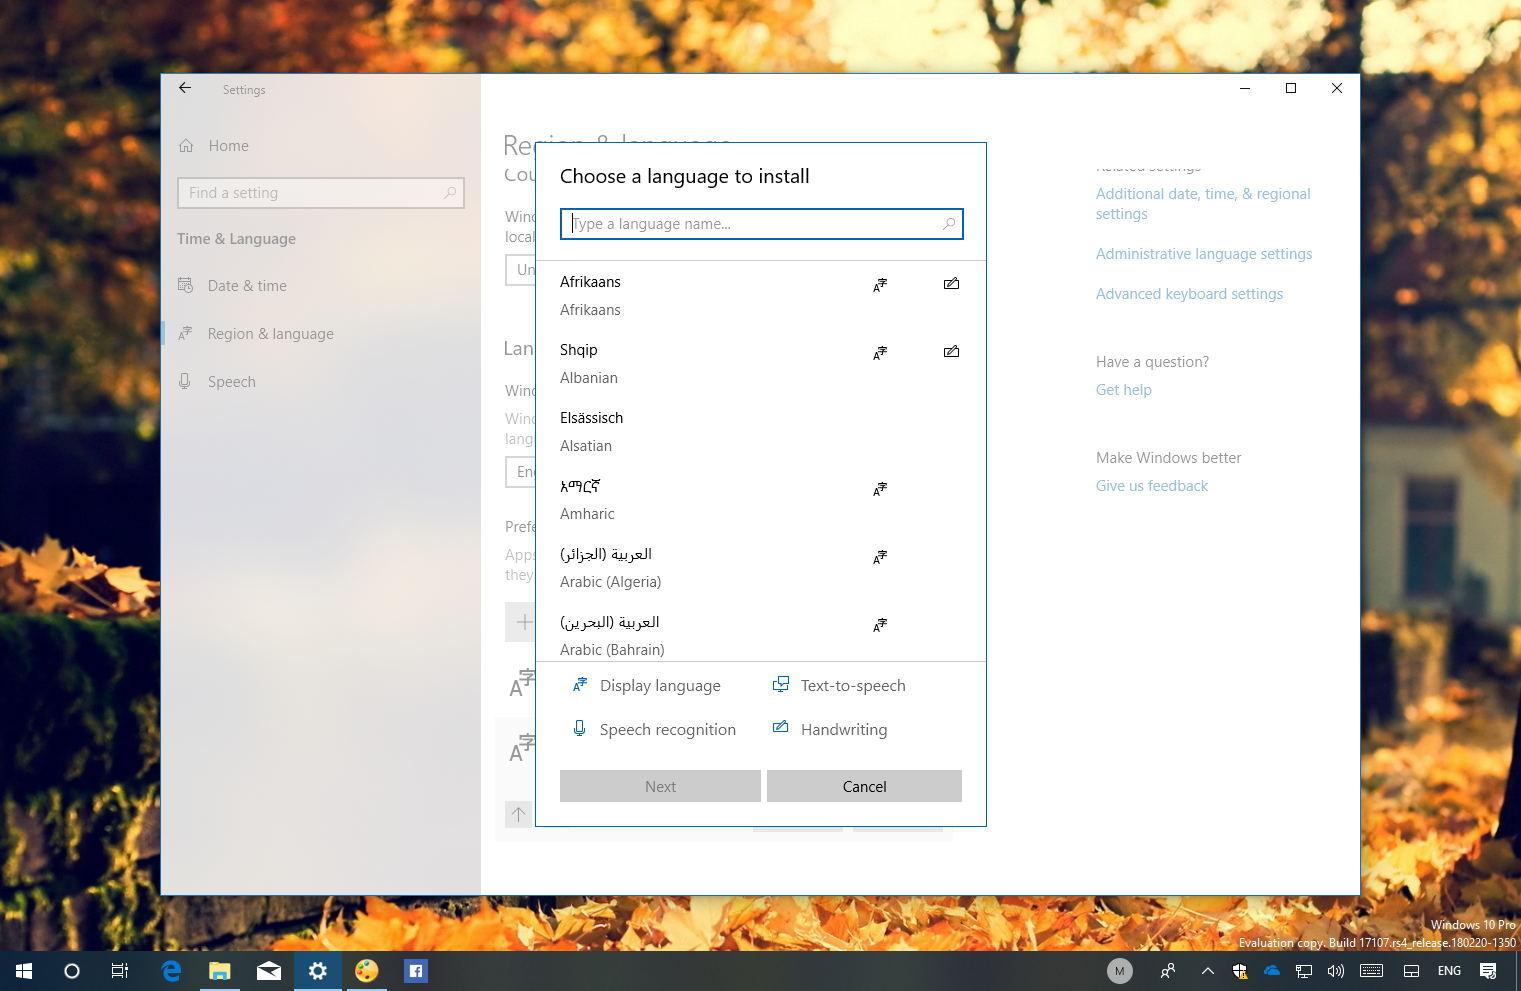 Adding a new language on WIndows 10